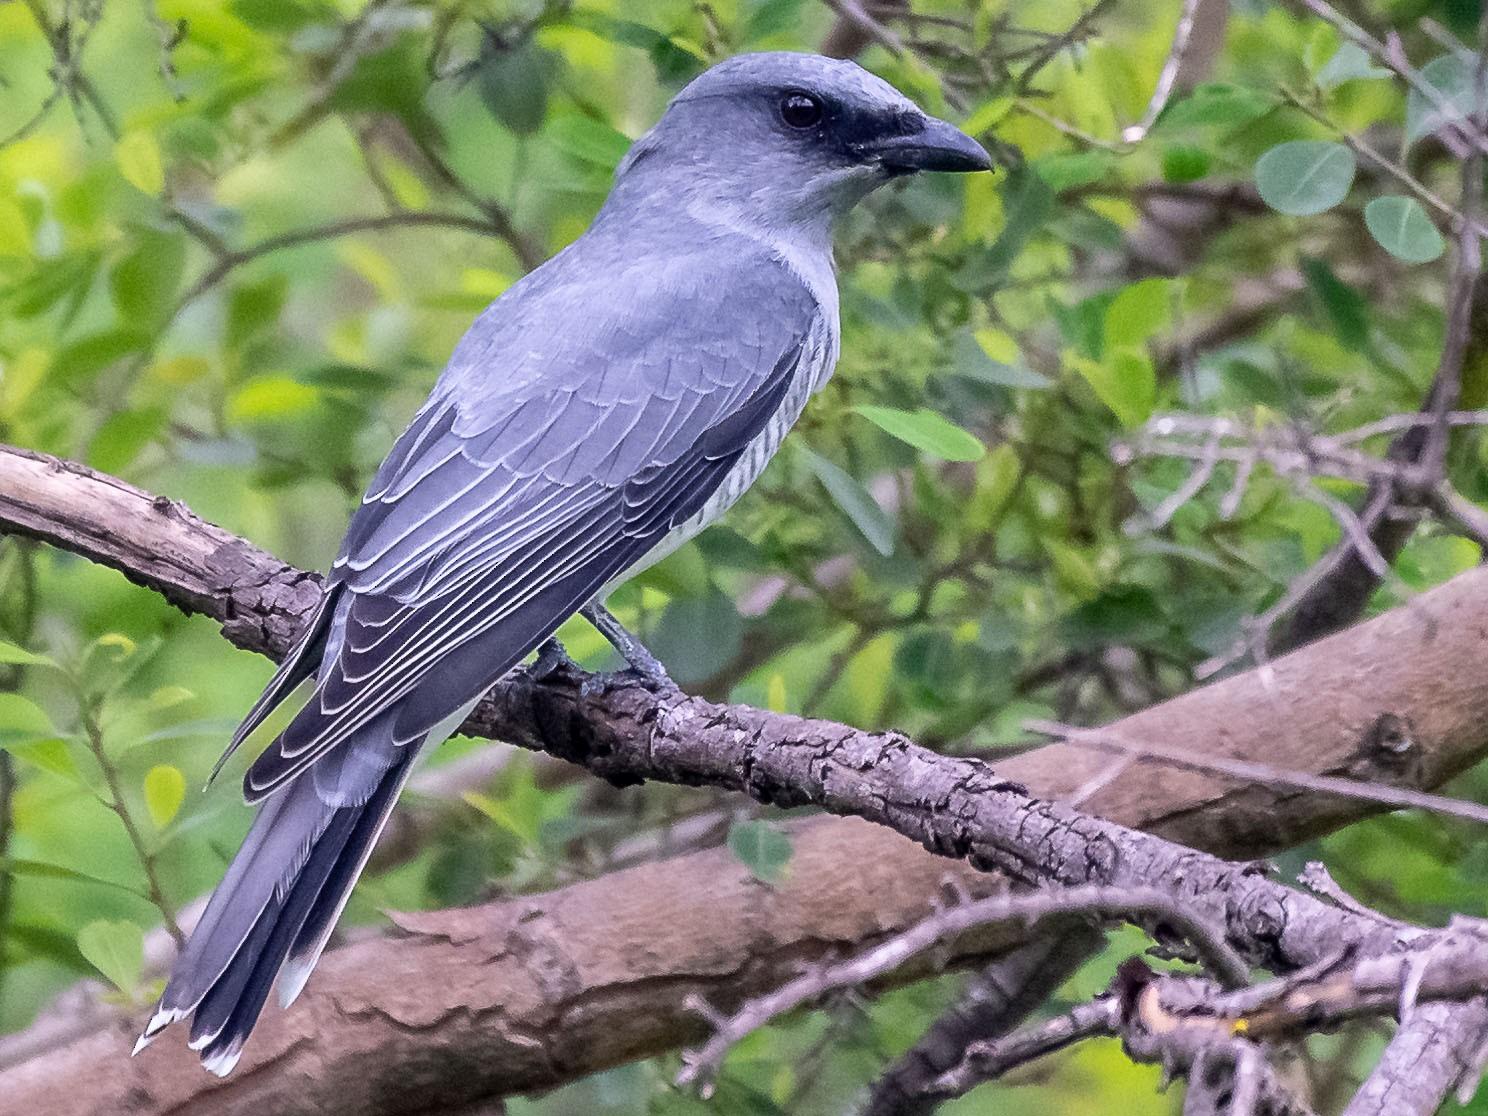 Large Cuckooshrike - Balaji P B